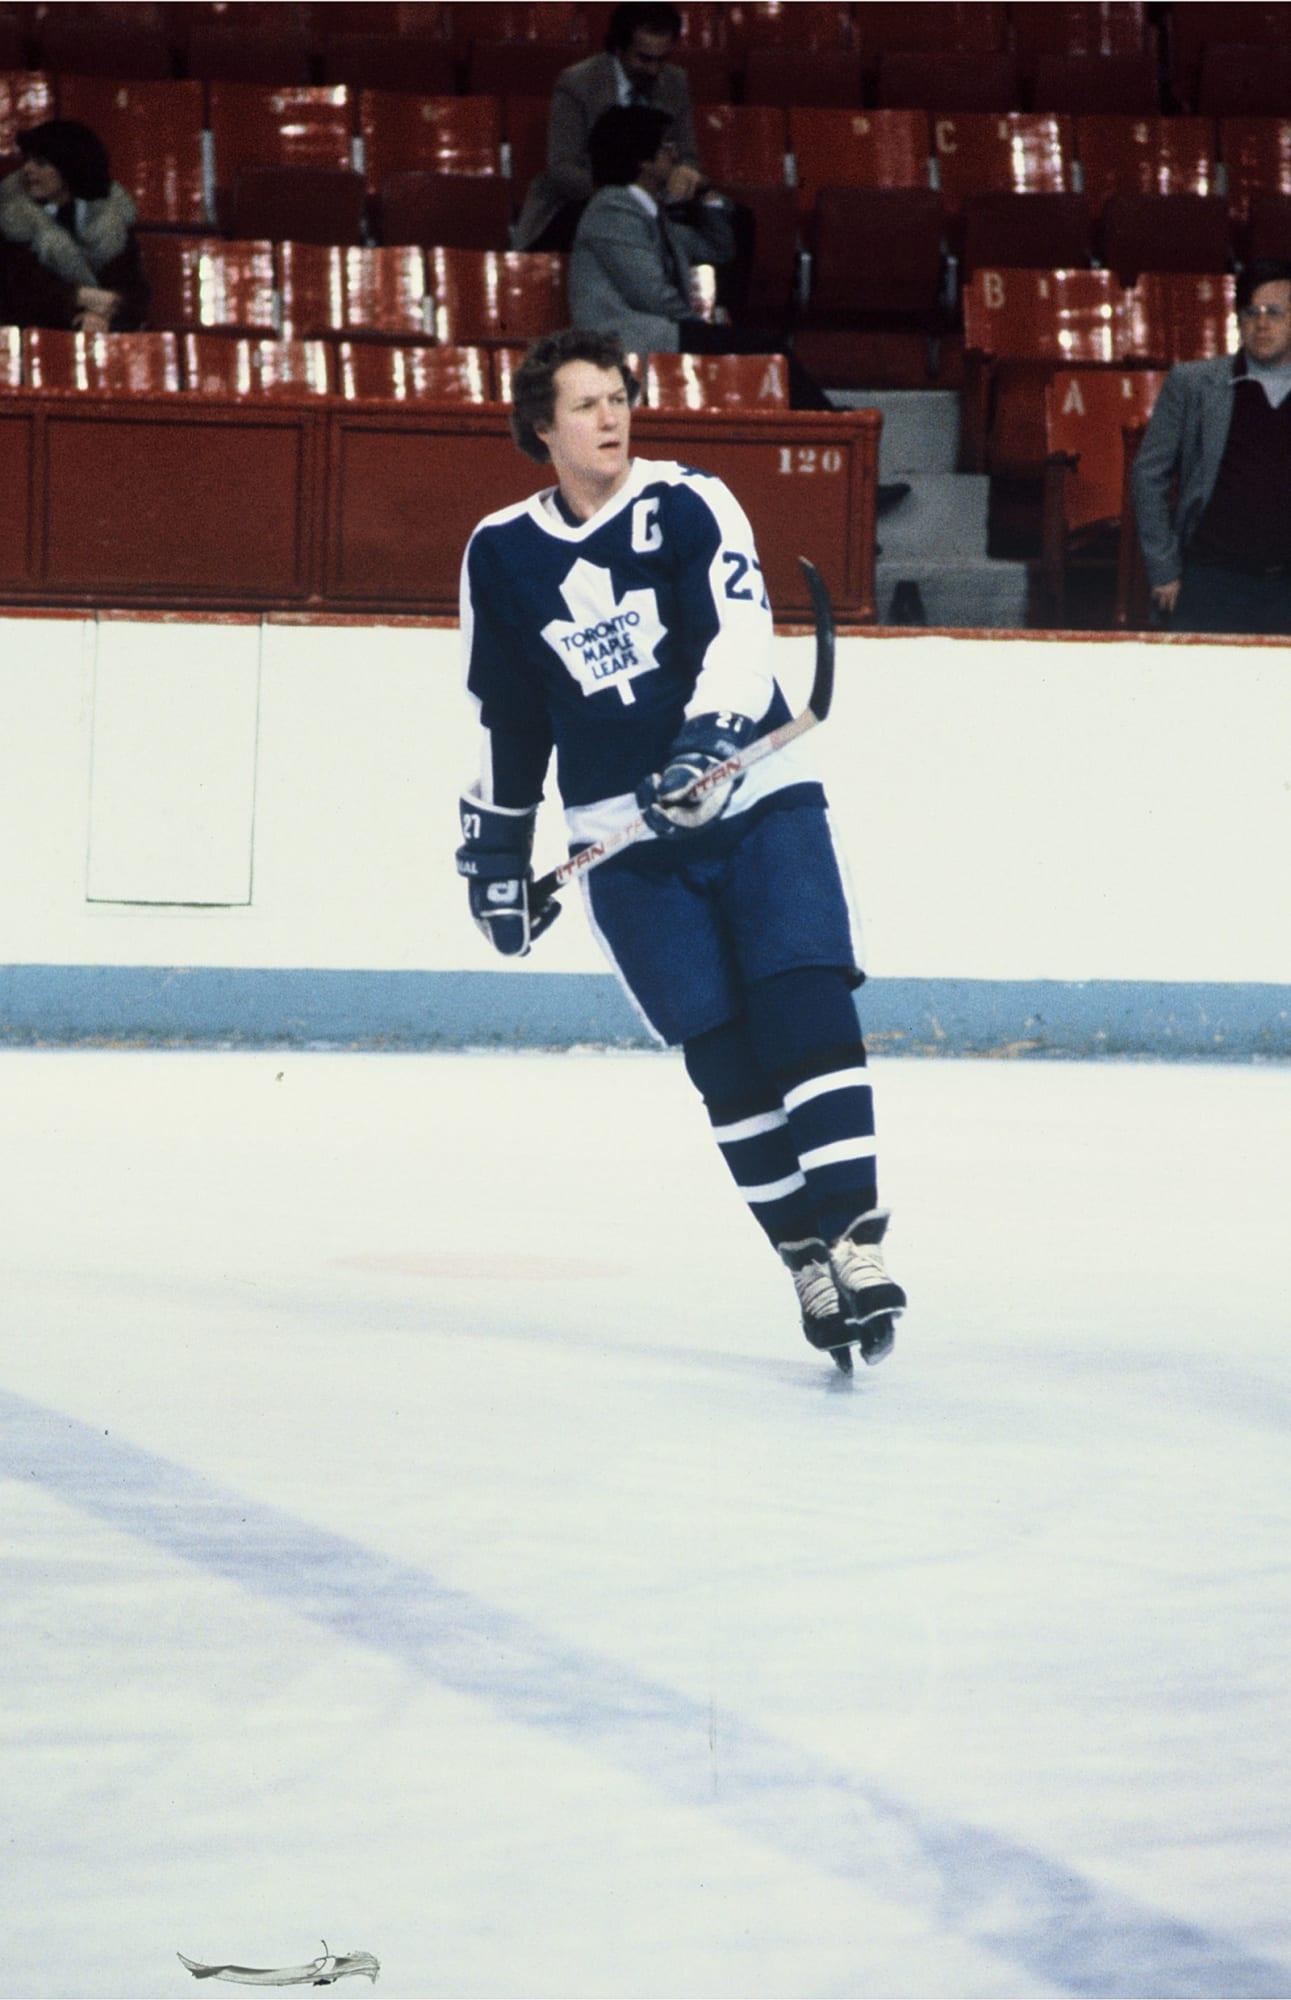 Toronto Maple Leafs: Darryl Sittler's 10 Point Night Was My Stanley Cup